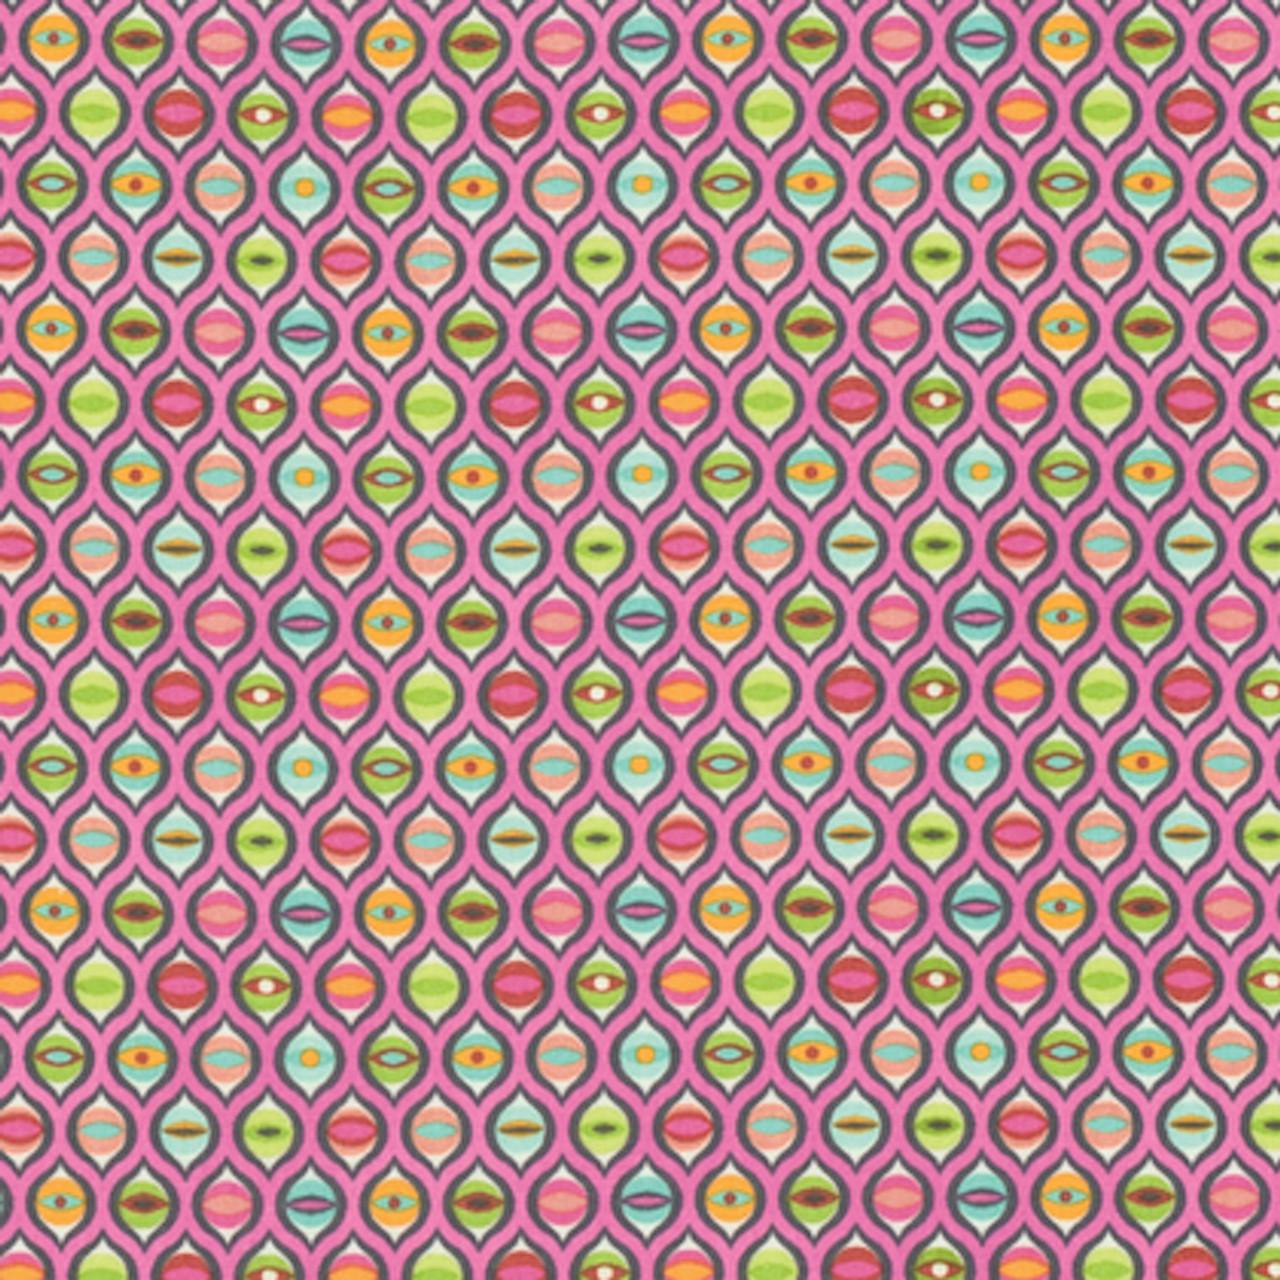 Tula Pink PWTP095 Tabby Road Cat Eyes Marmalade Skies Cotton Fabric By Yard